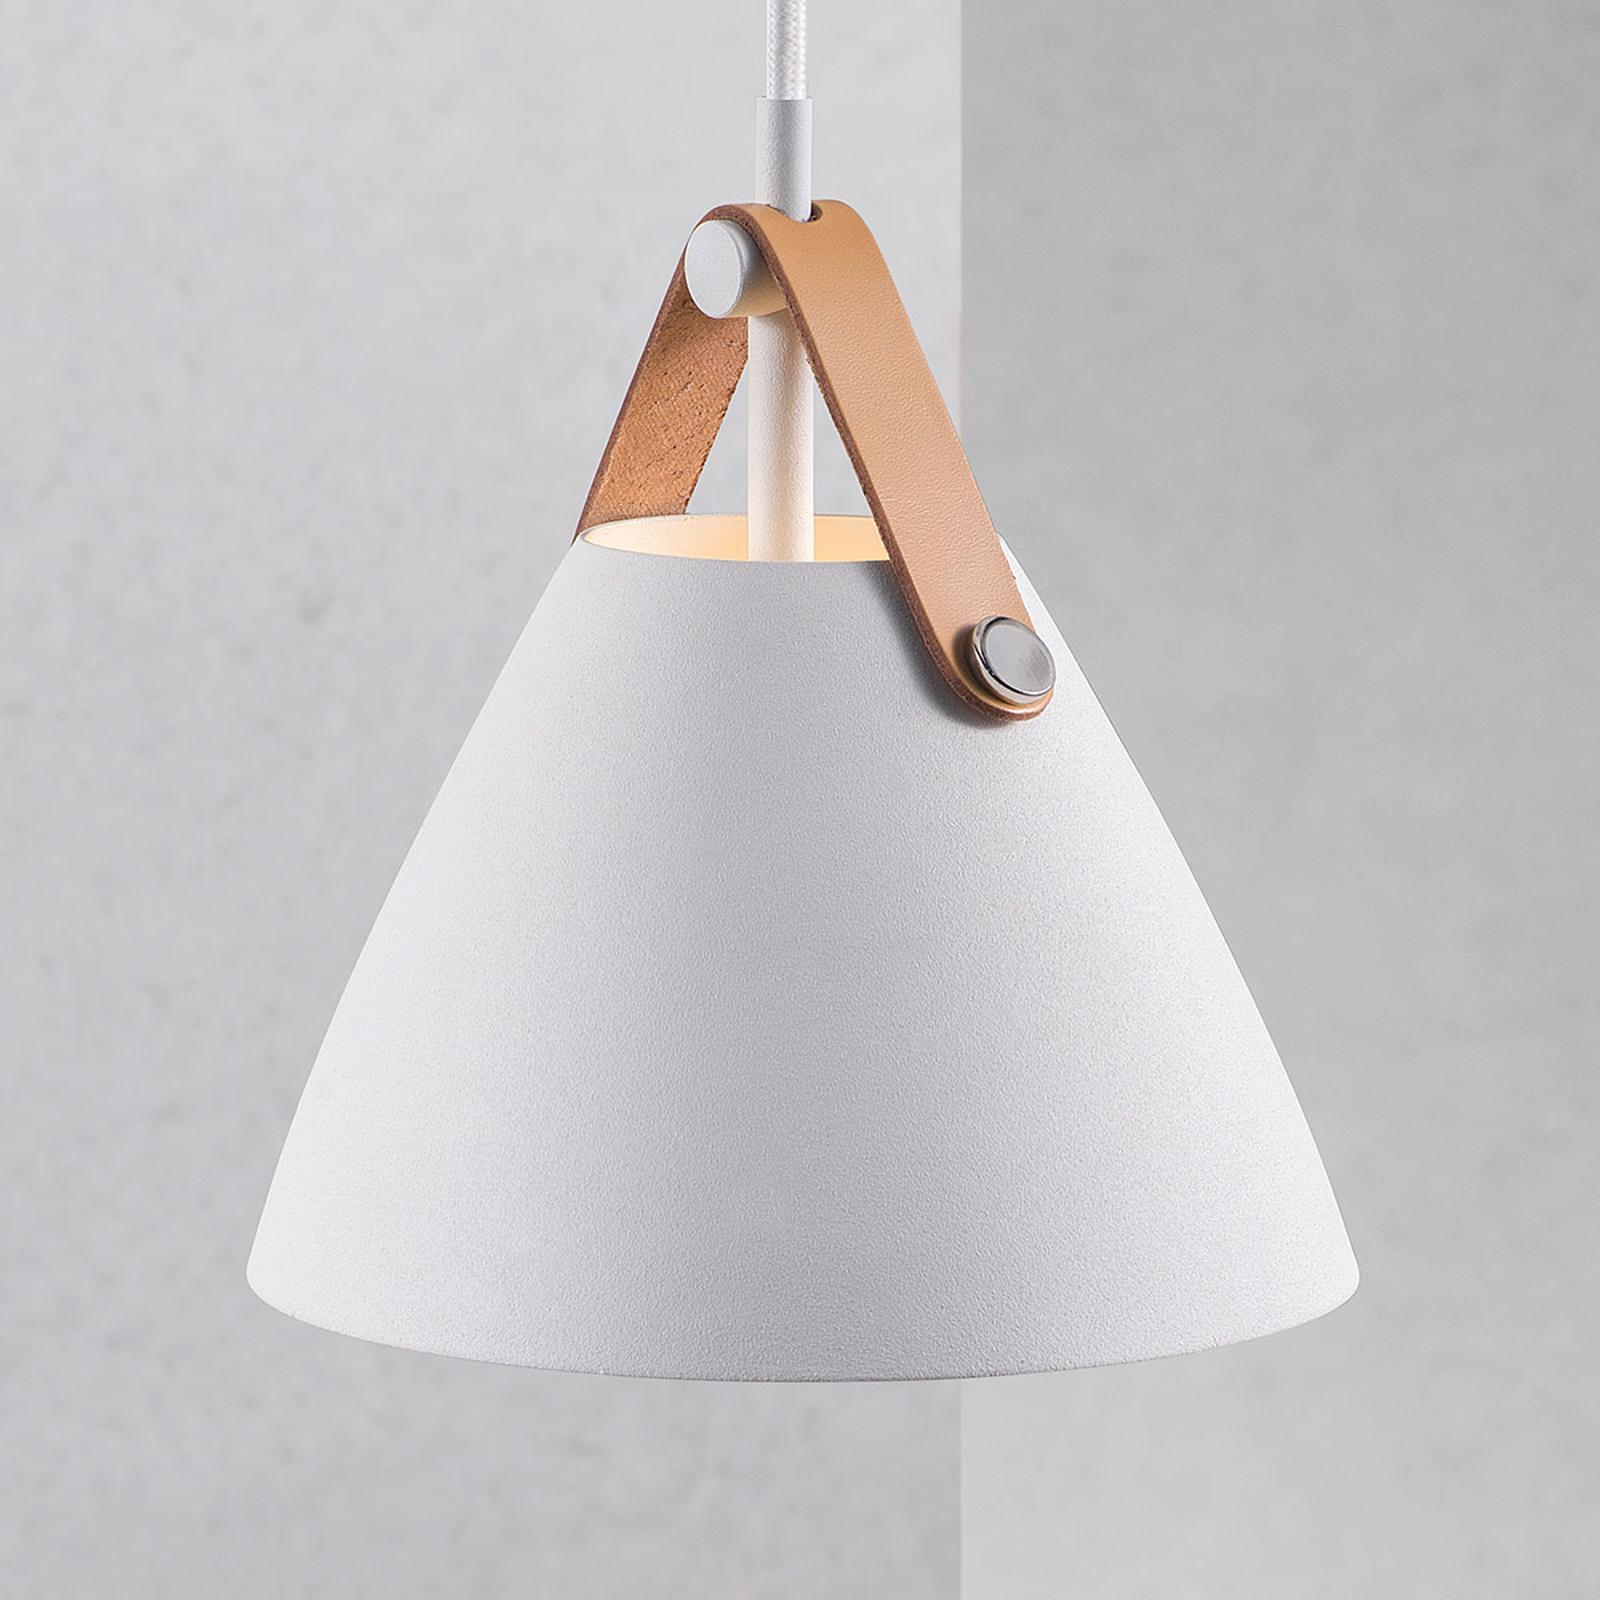 Lampa wisząca Strap, Ø 16,5 cm, biała